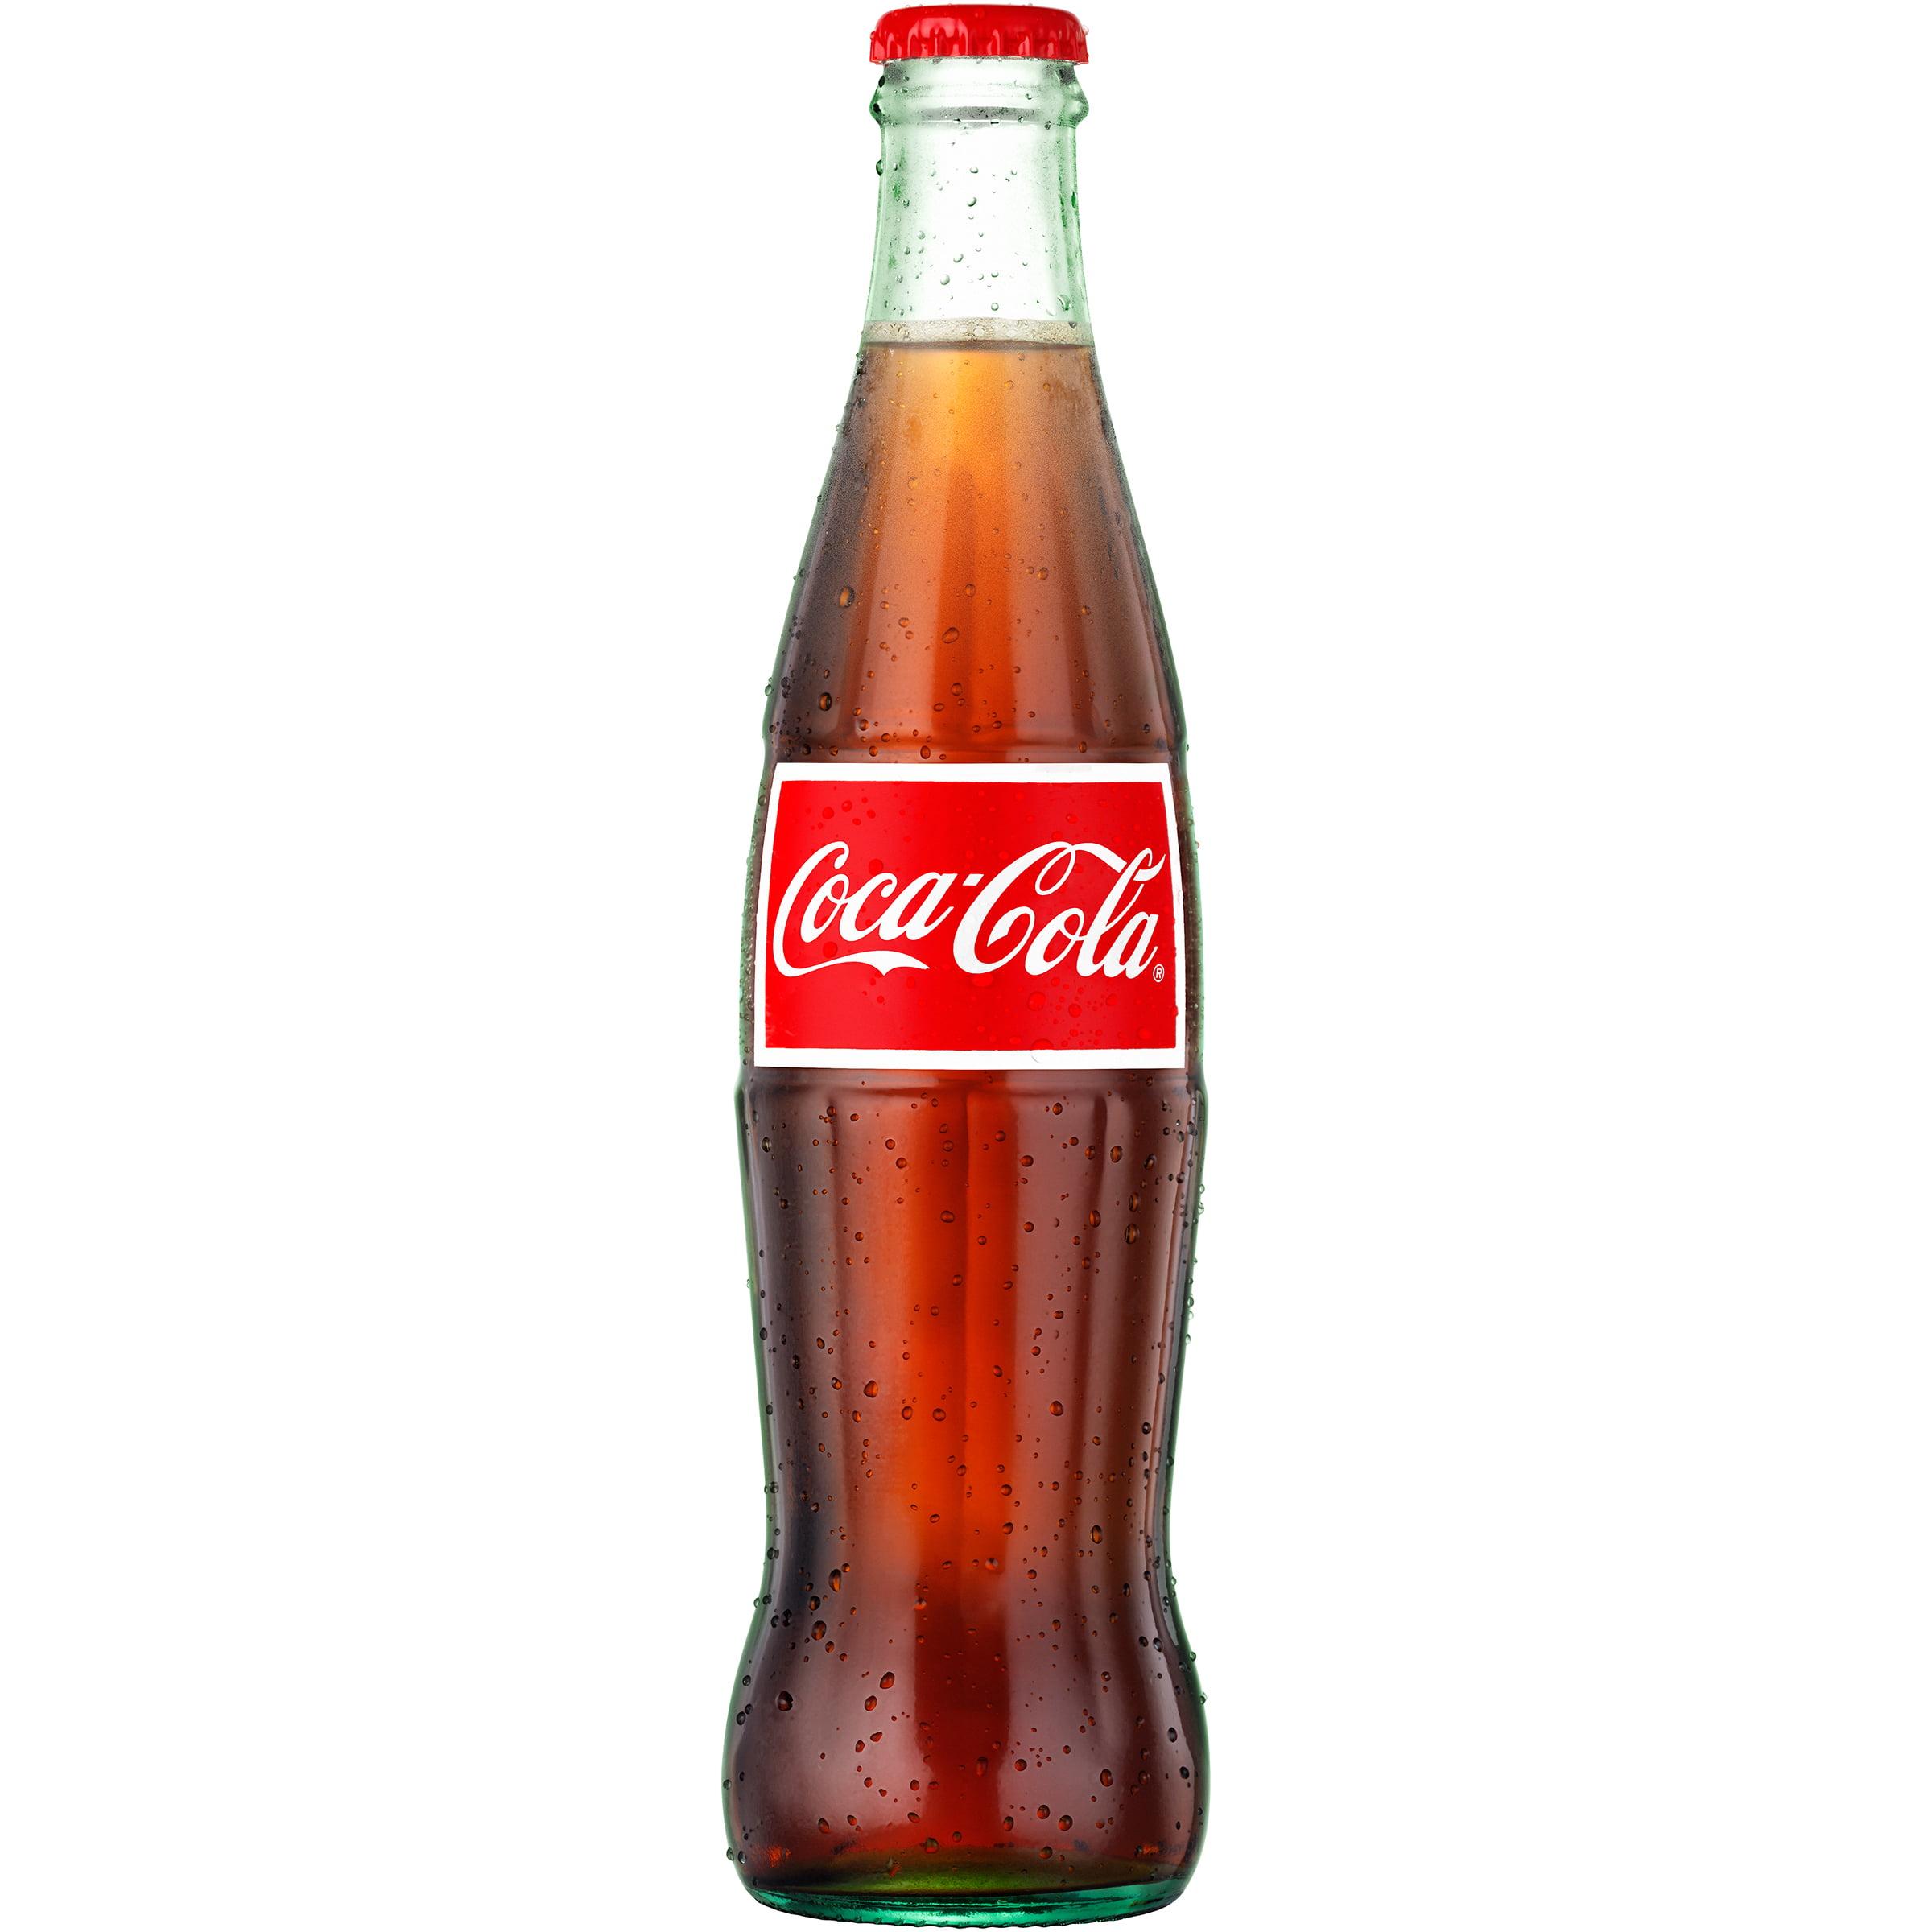 Coca-Cola Glass Bottle Soda, 12 Fl Oz, 1 Count - Walmart.com